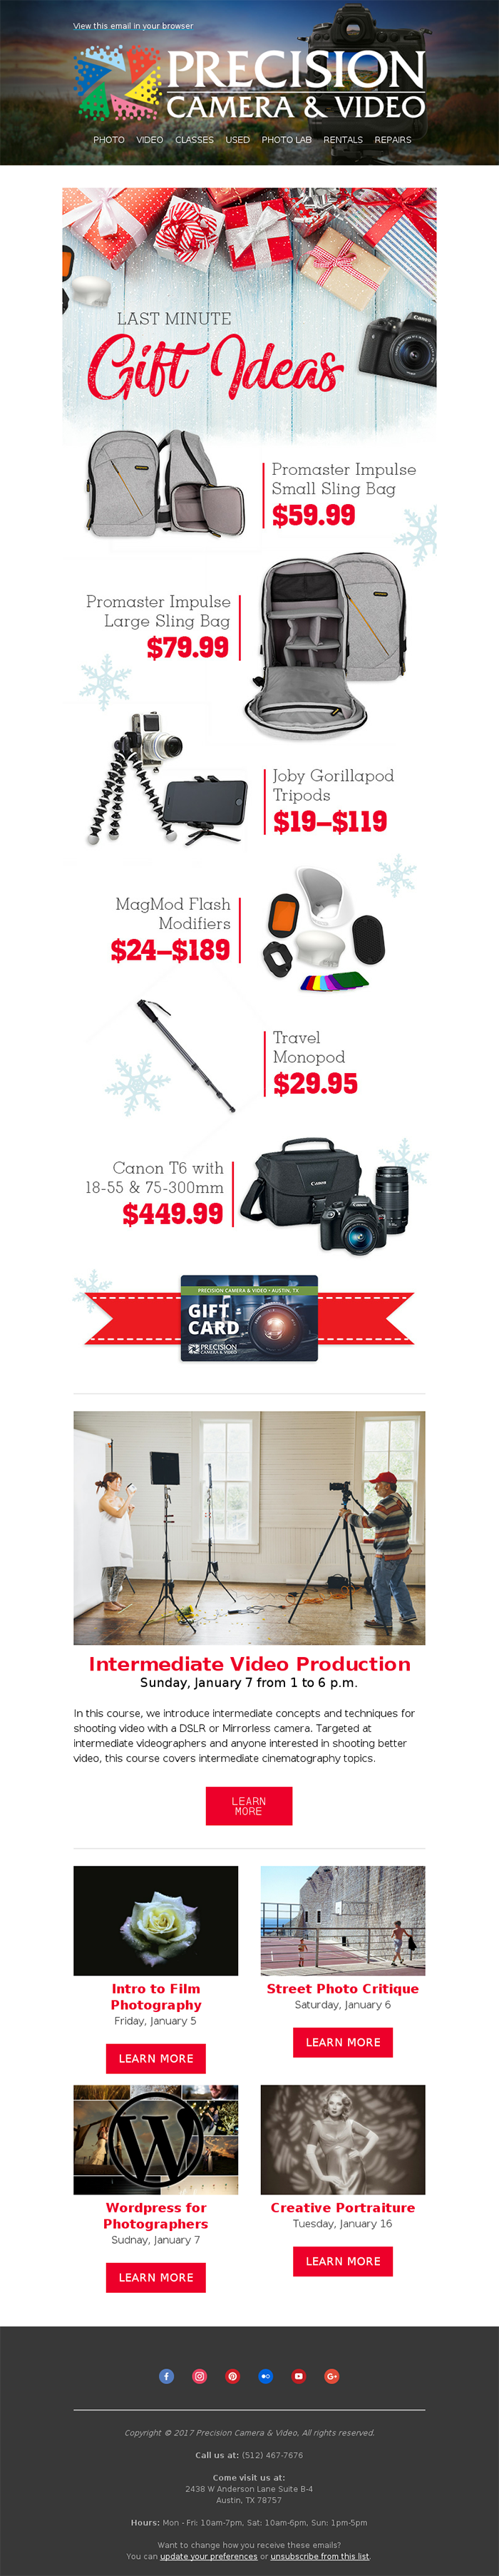 Email vacanza Marekting Precision Camera Natale